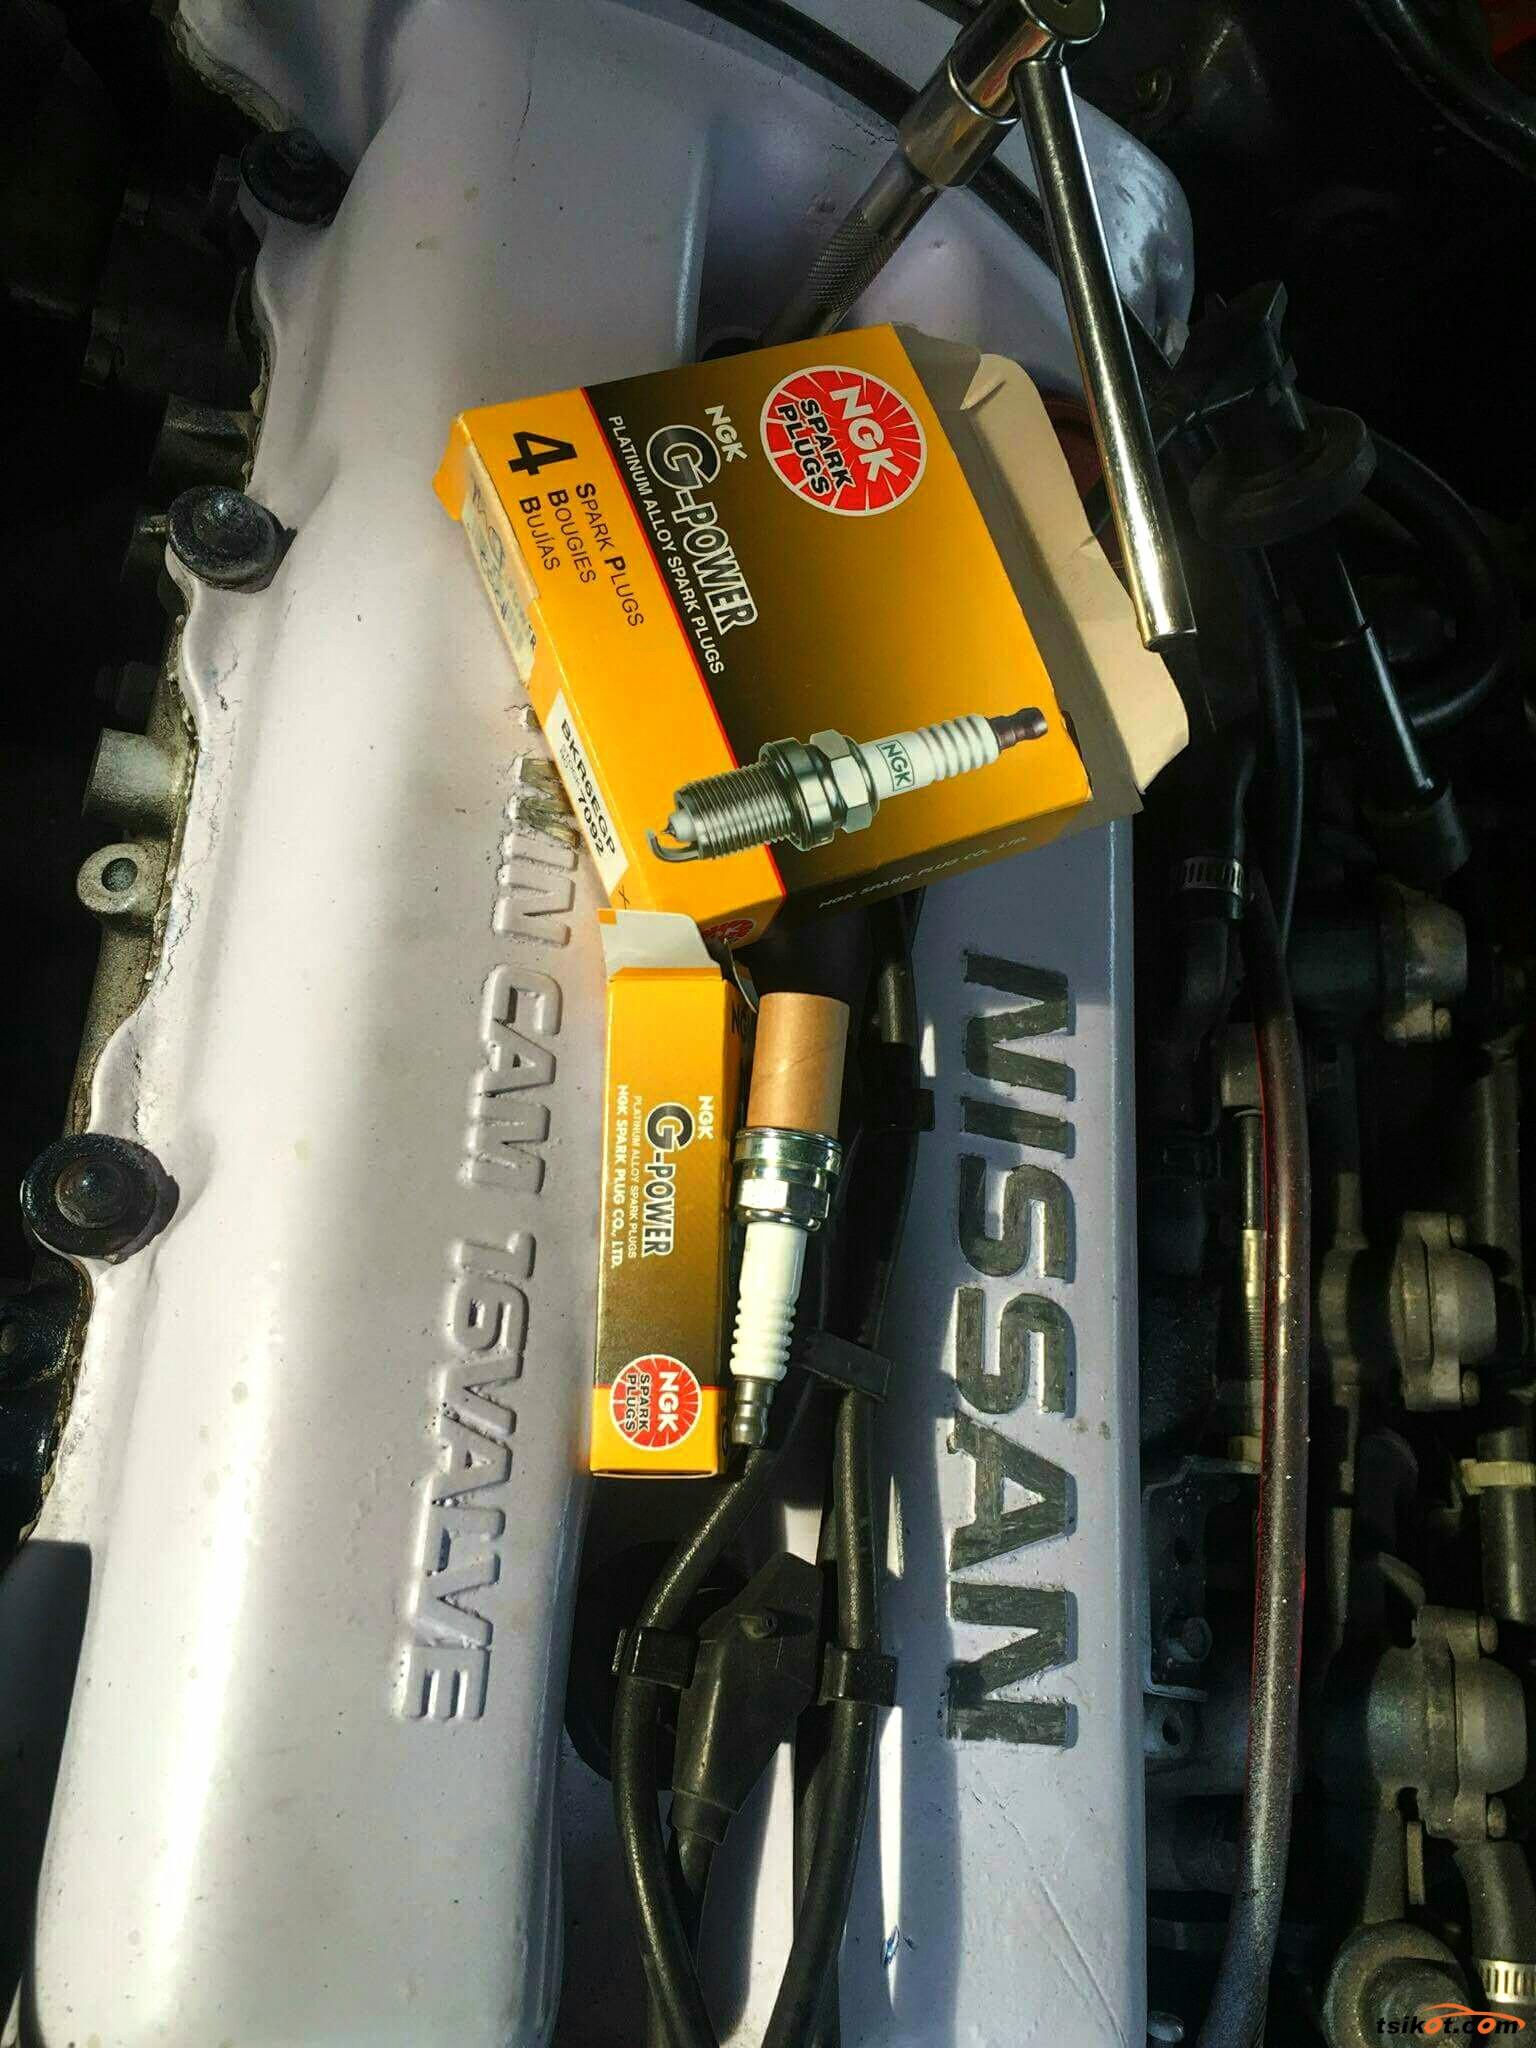 Nissan Sentra 1995 - Car for Sale Metro Manila